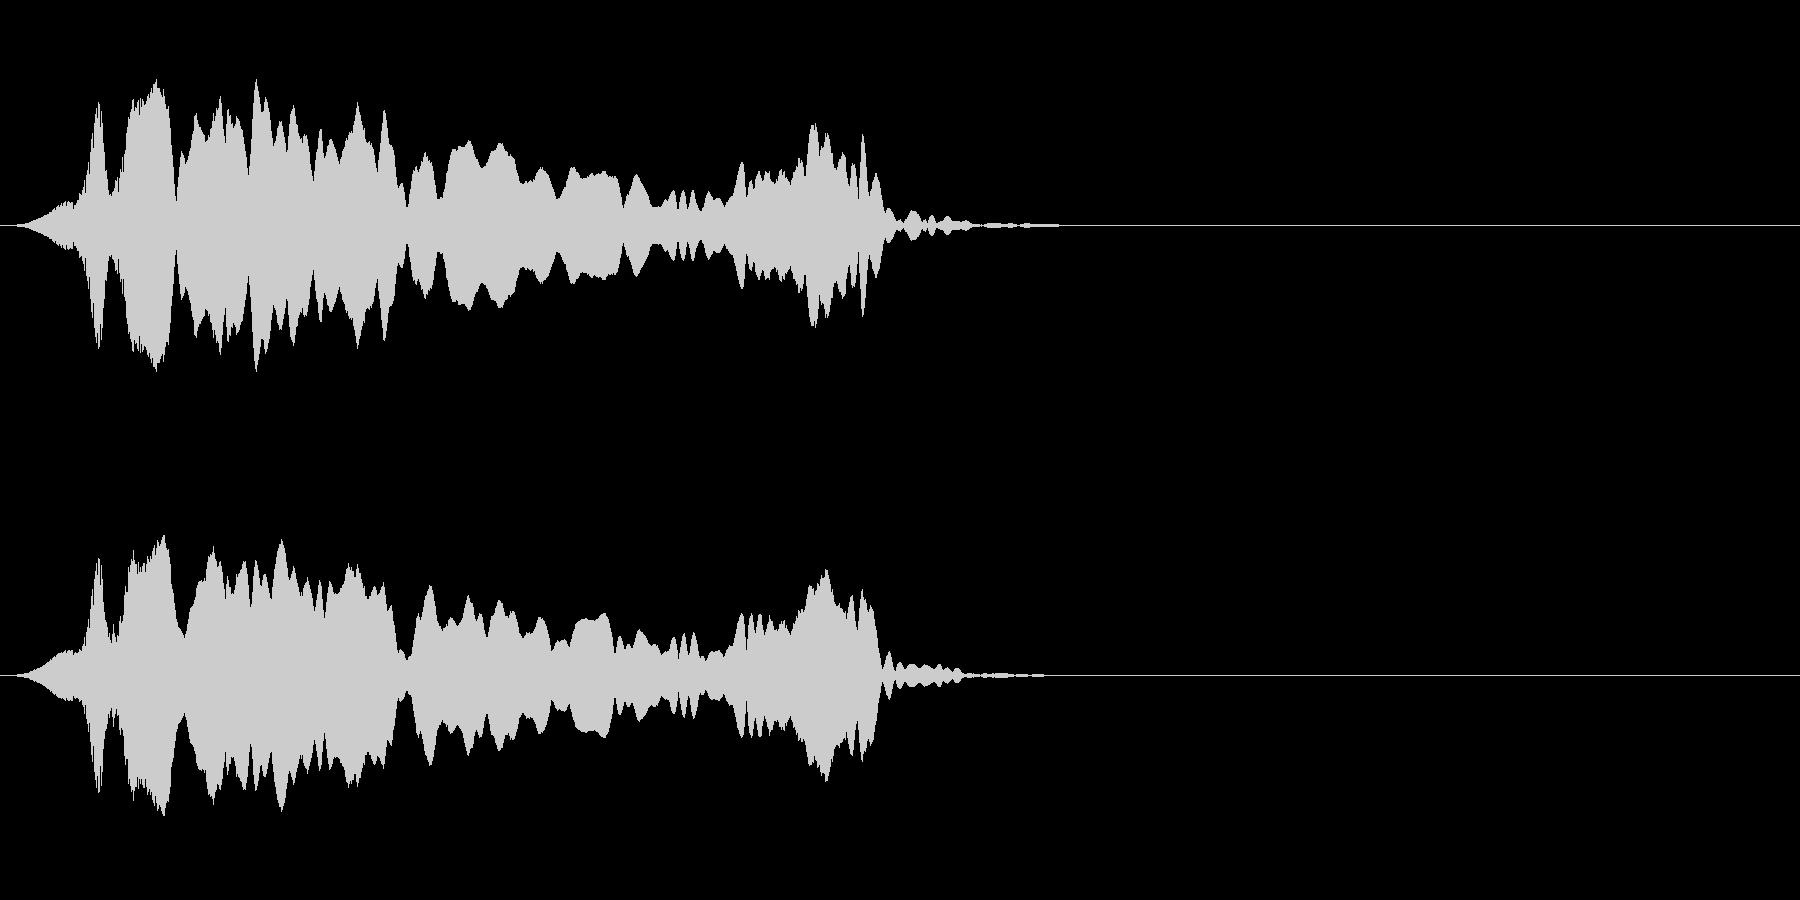 尺八 生演奏 古典風#9の未再生の波形